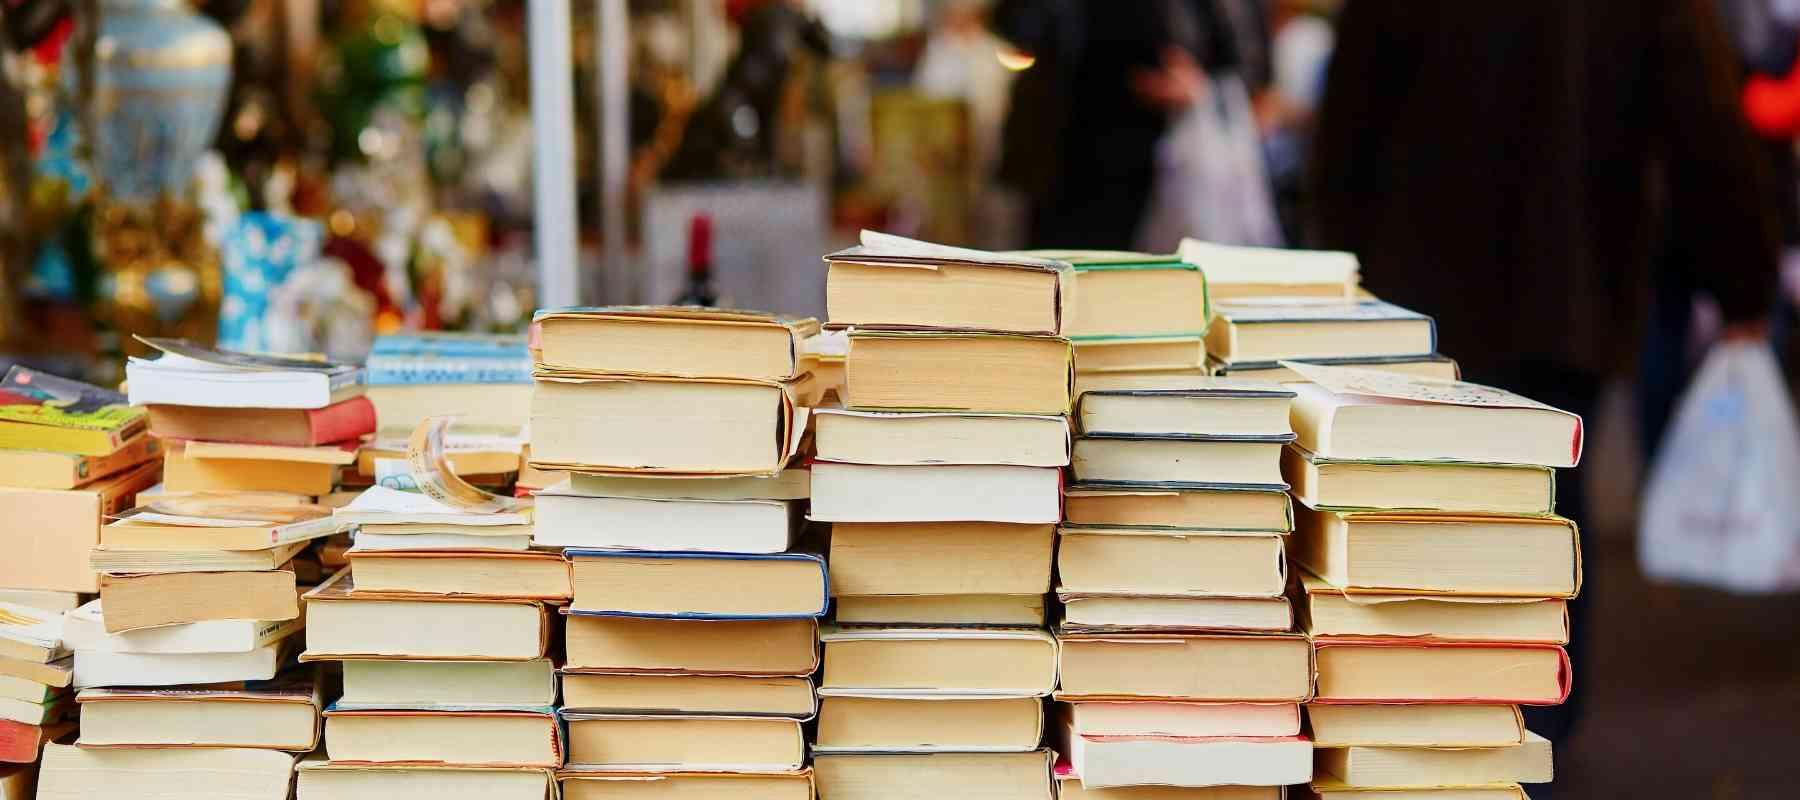 Flea Market Flipping Books